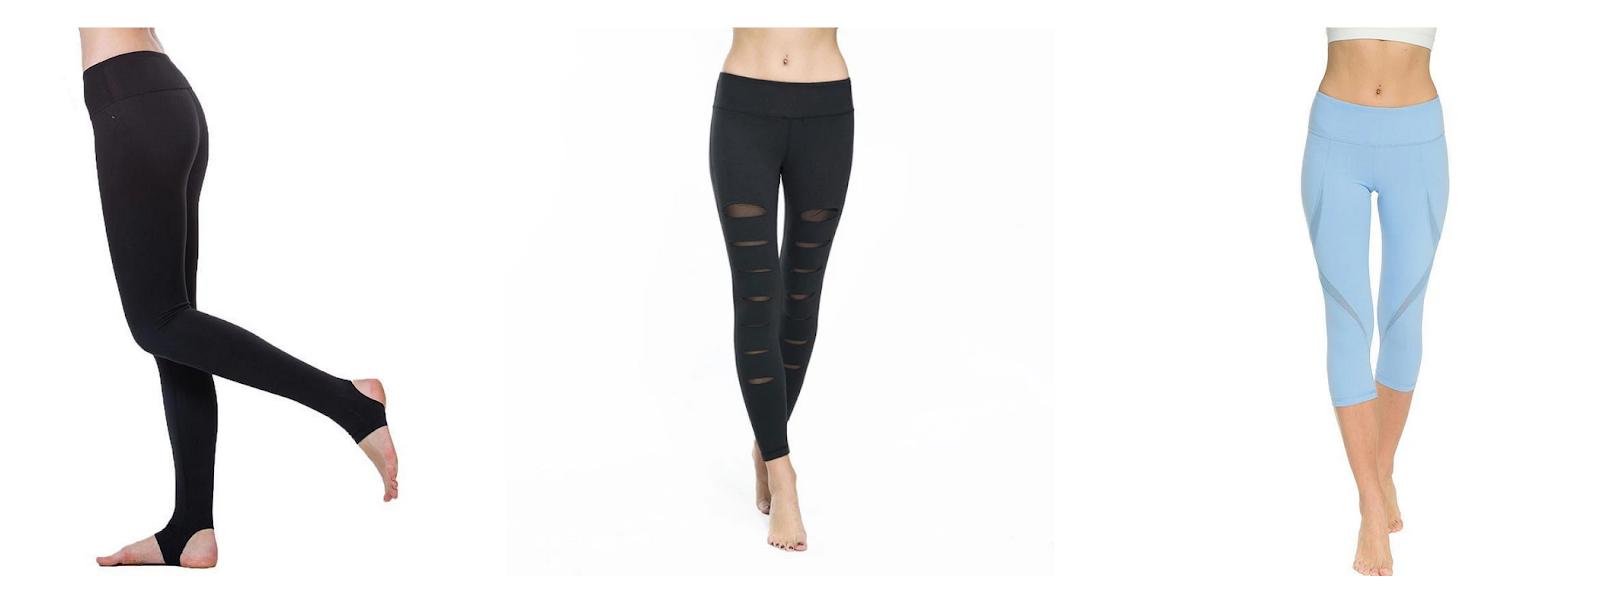 Womens Comfy Leggings | Girls Got Fitness